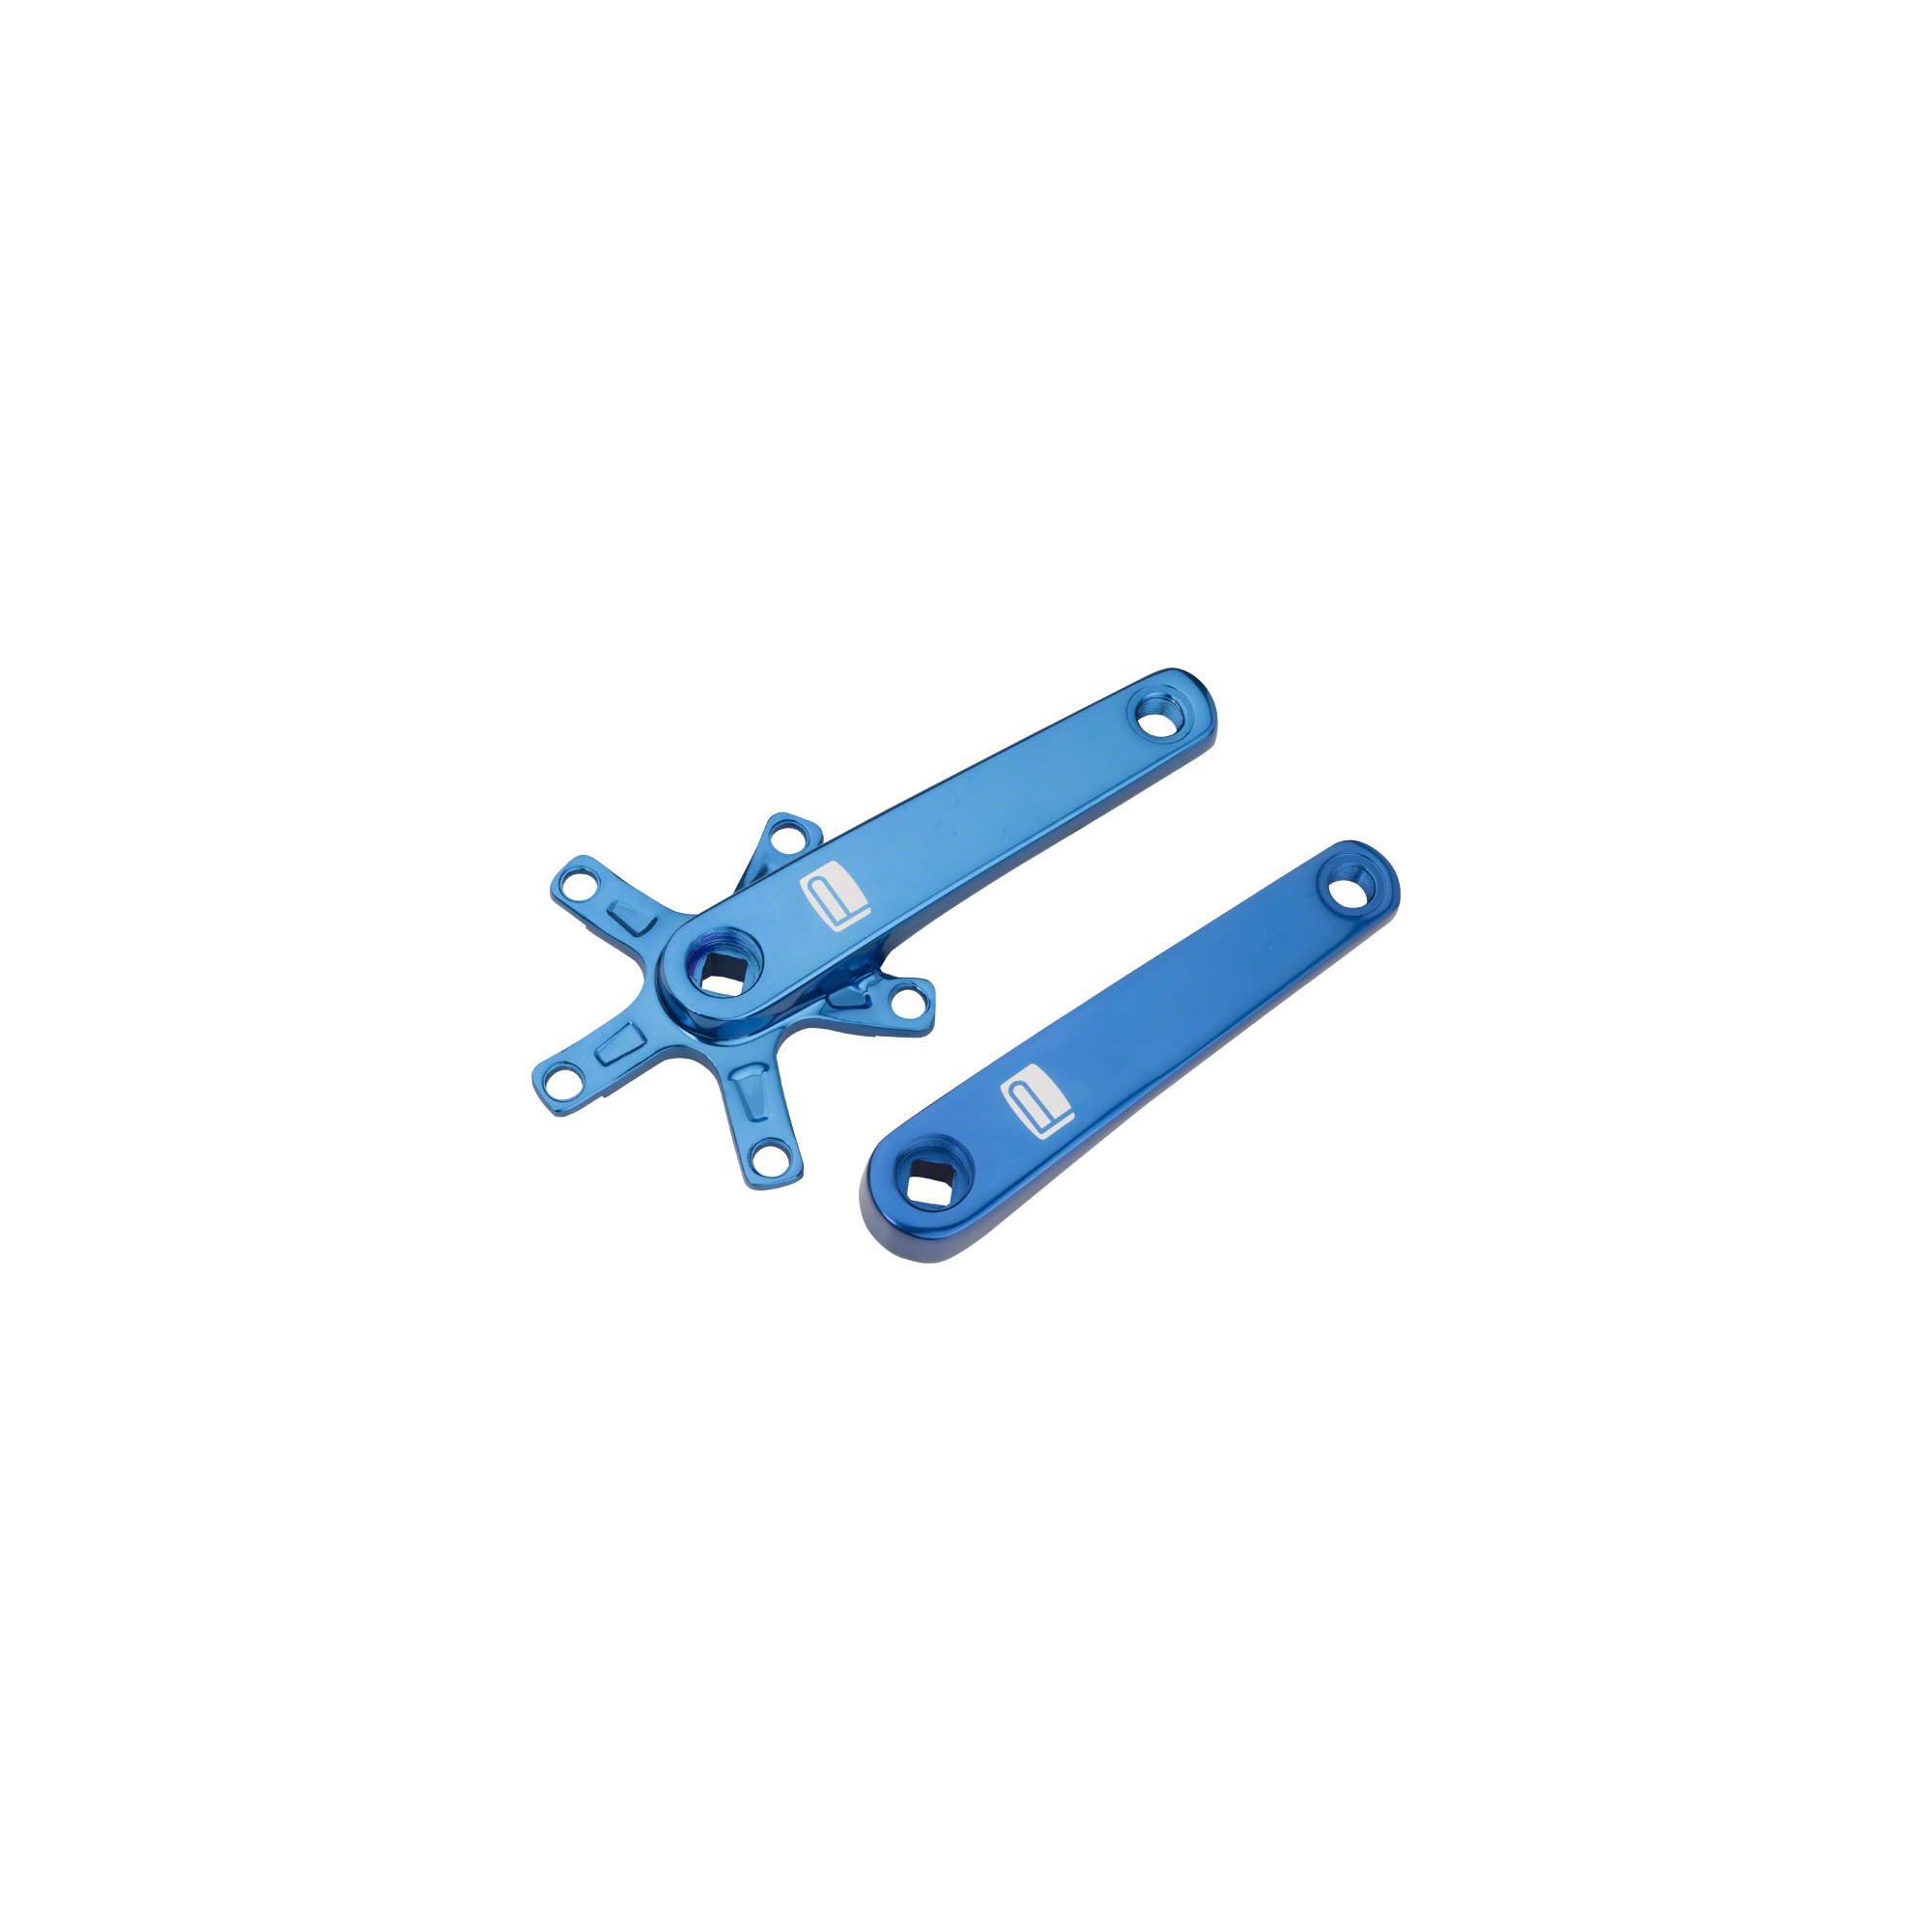 Promax SQ-1 Square Taper JIS Cold Forged Crank Arms 165mm Blue